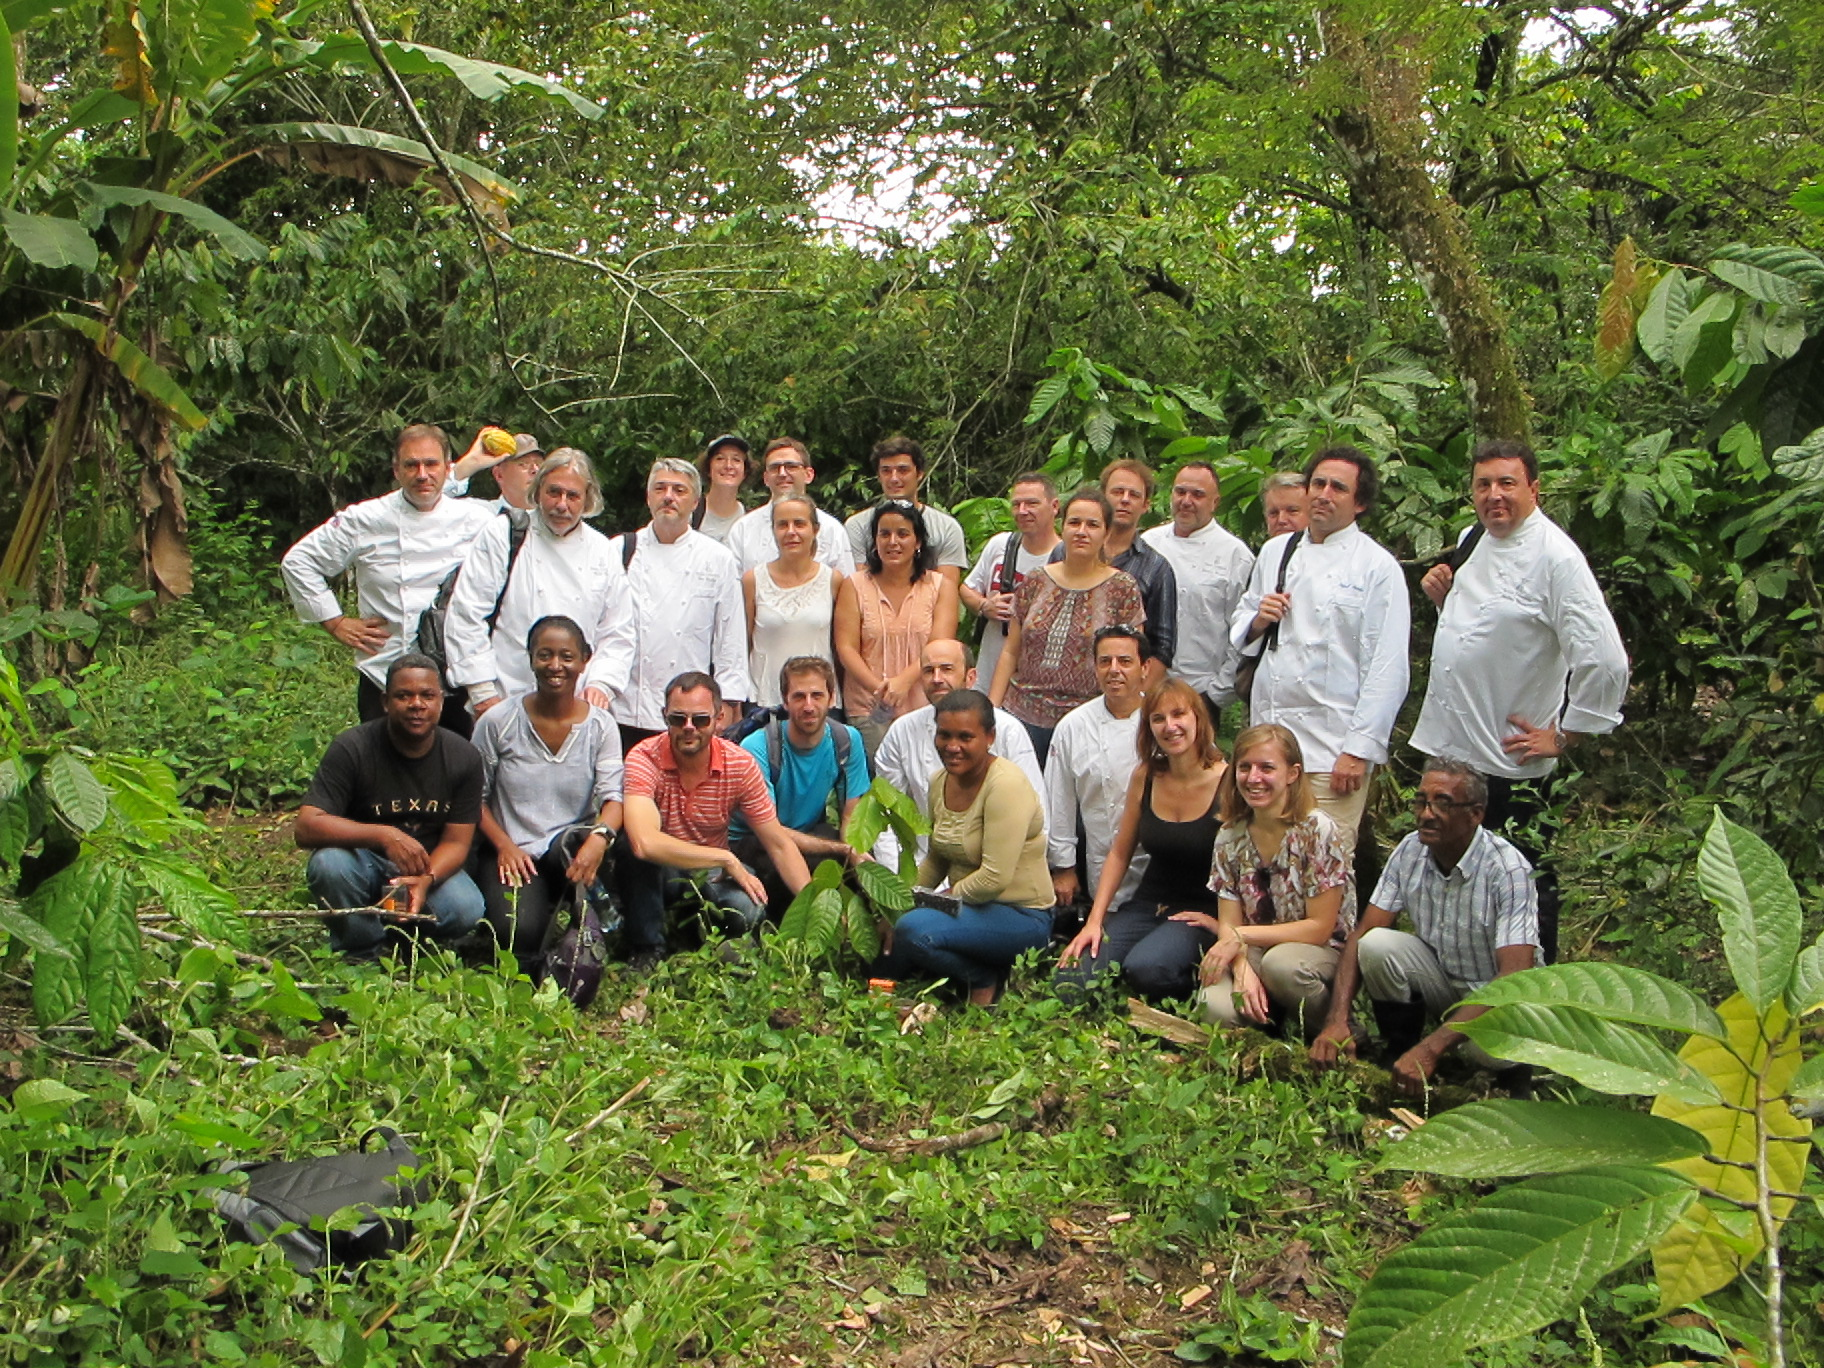 Representatives of Conacado, Cirad, Earthworm Foundation, Alter Eco, Relais Desserts, Valrhona and Weiss